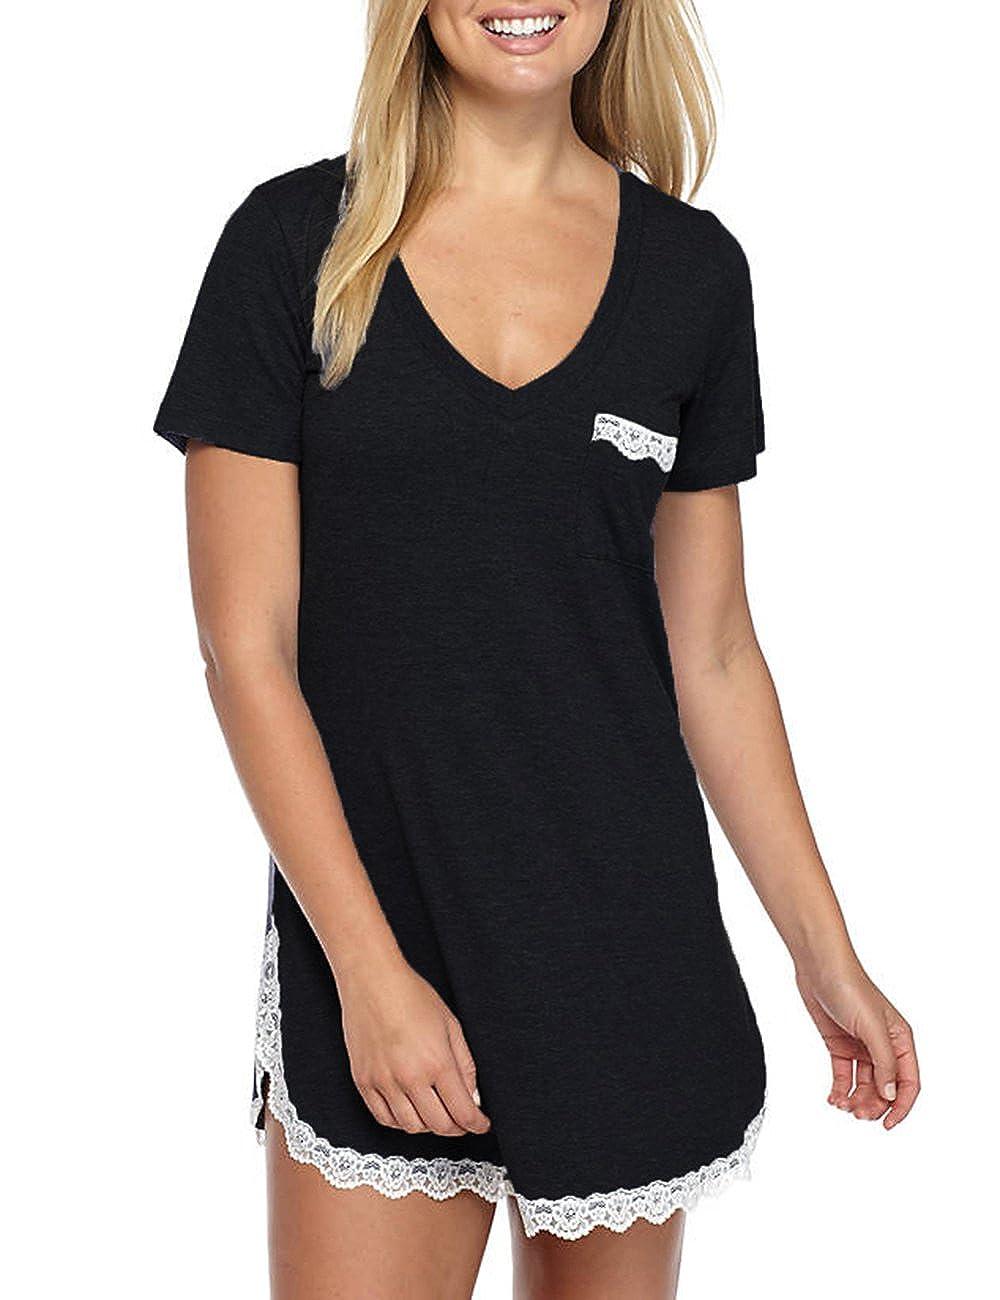 Black GUANYY Women's Nightgown Cotton Sleepshirt Sexy Lace Chemise Sleepwear